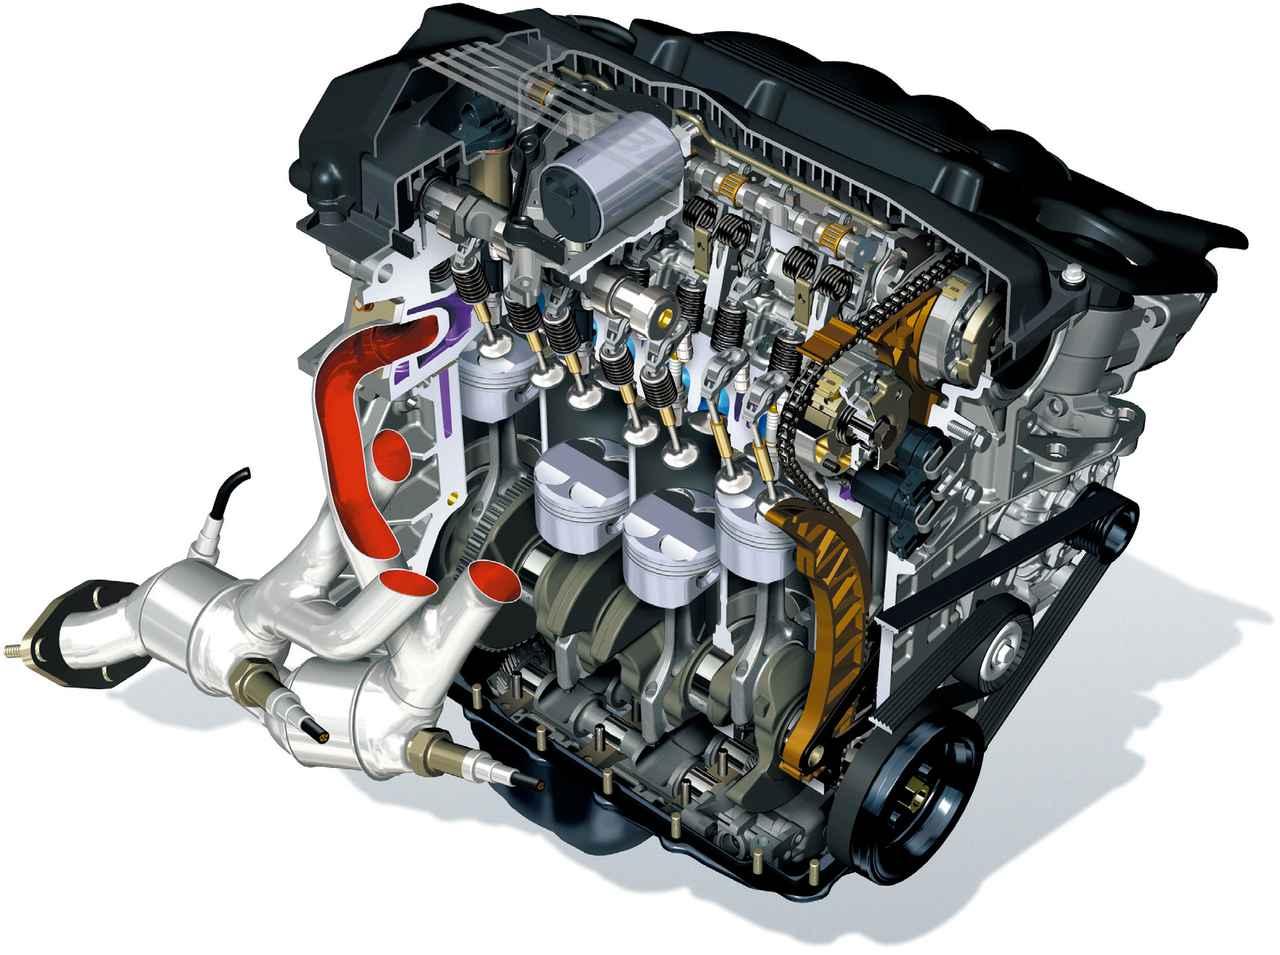 Images : 8番目の画像 - BMW 325iと320i - Webモーターマガジン